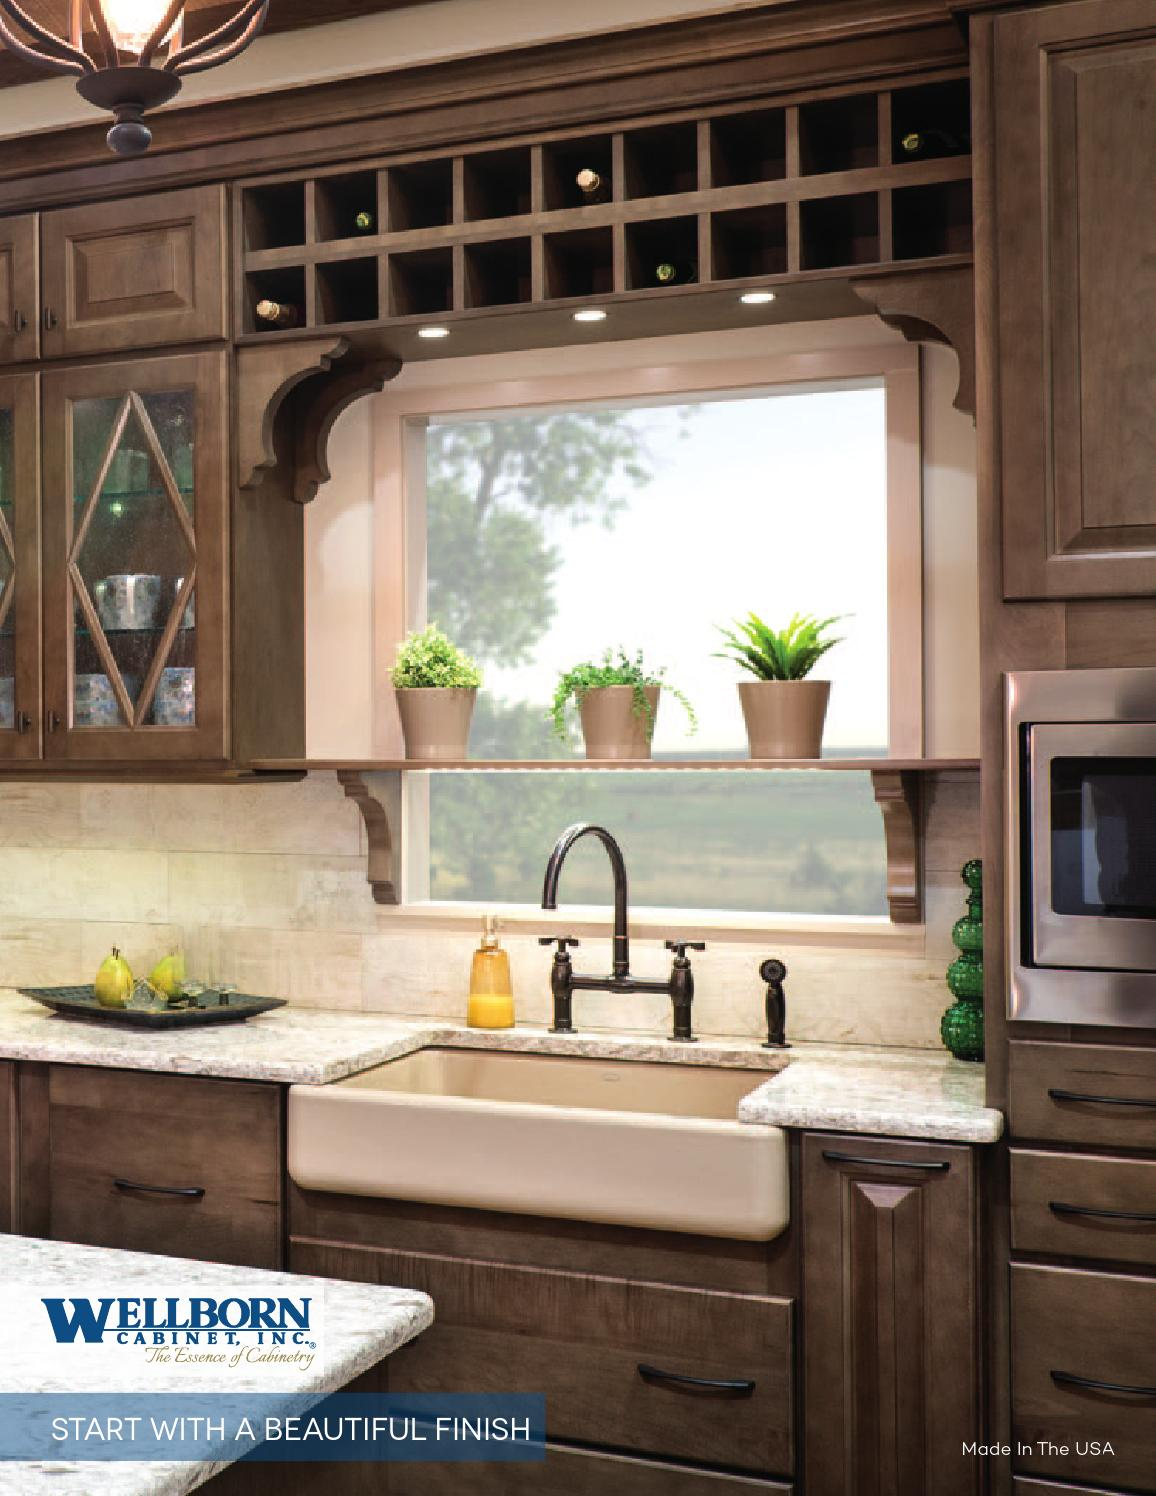 wellborn cabinets by meek 39 s lumber hardware issuu. Black Bedroom Furniture Sets. Home Design Ideas